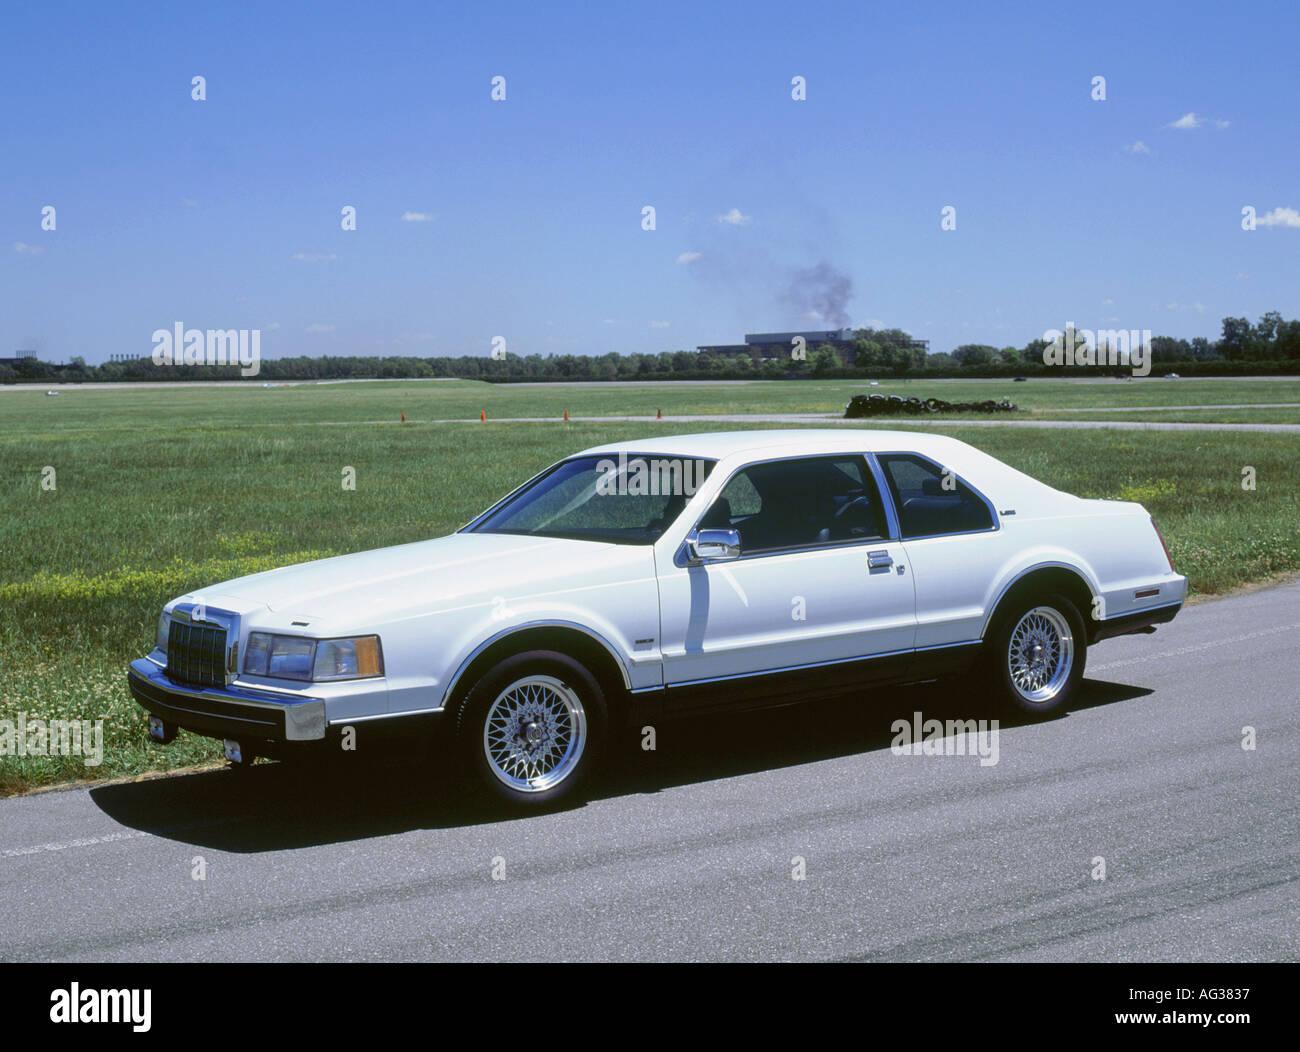 1991 Lincoln mk 7 LSC Banque D'Images